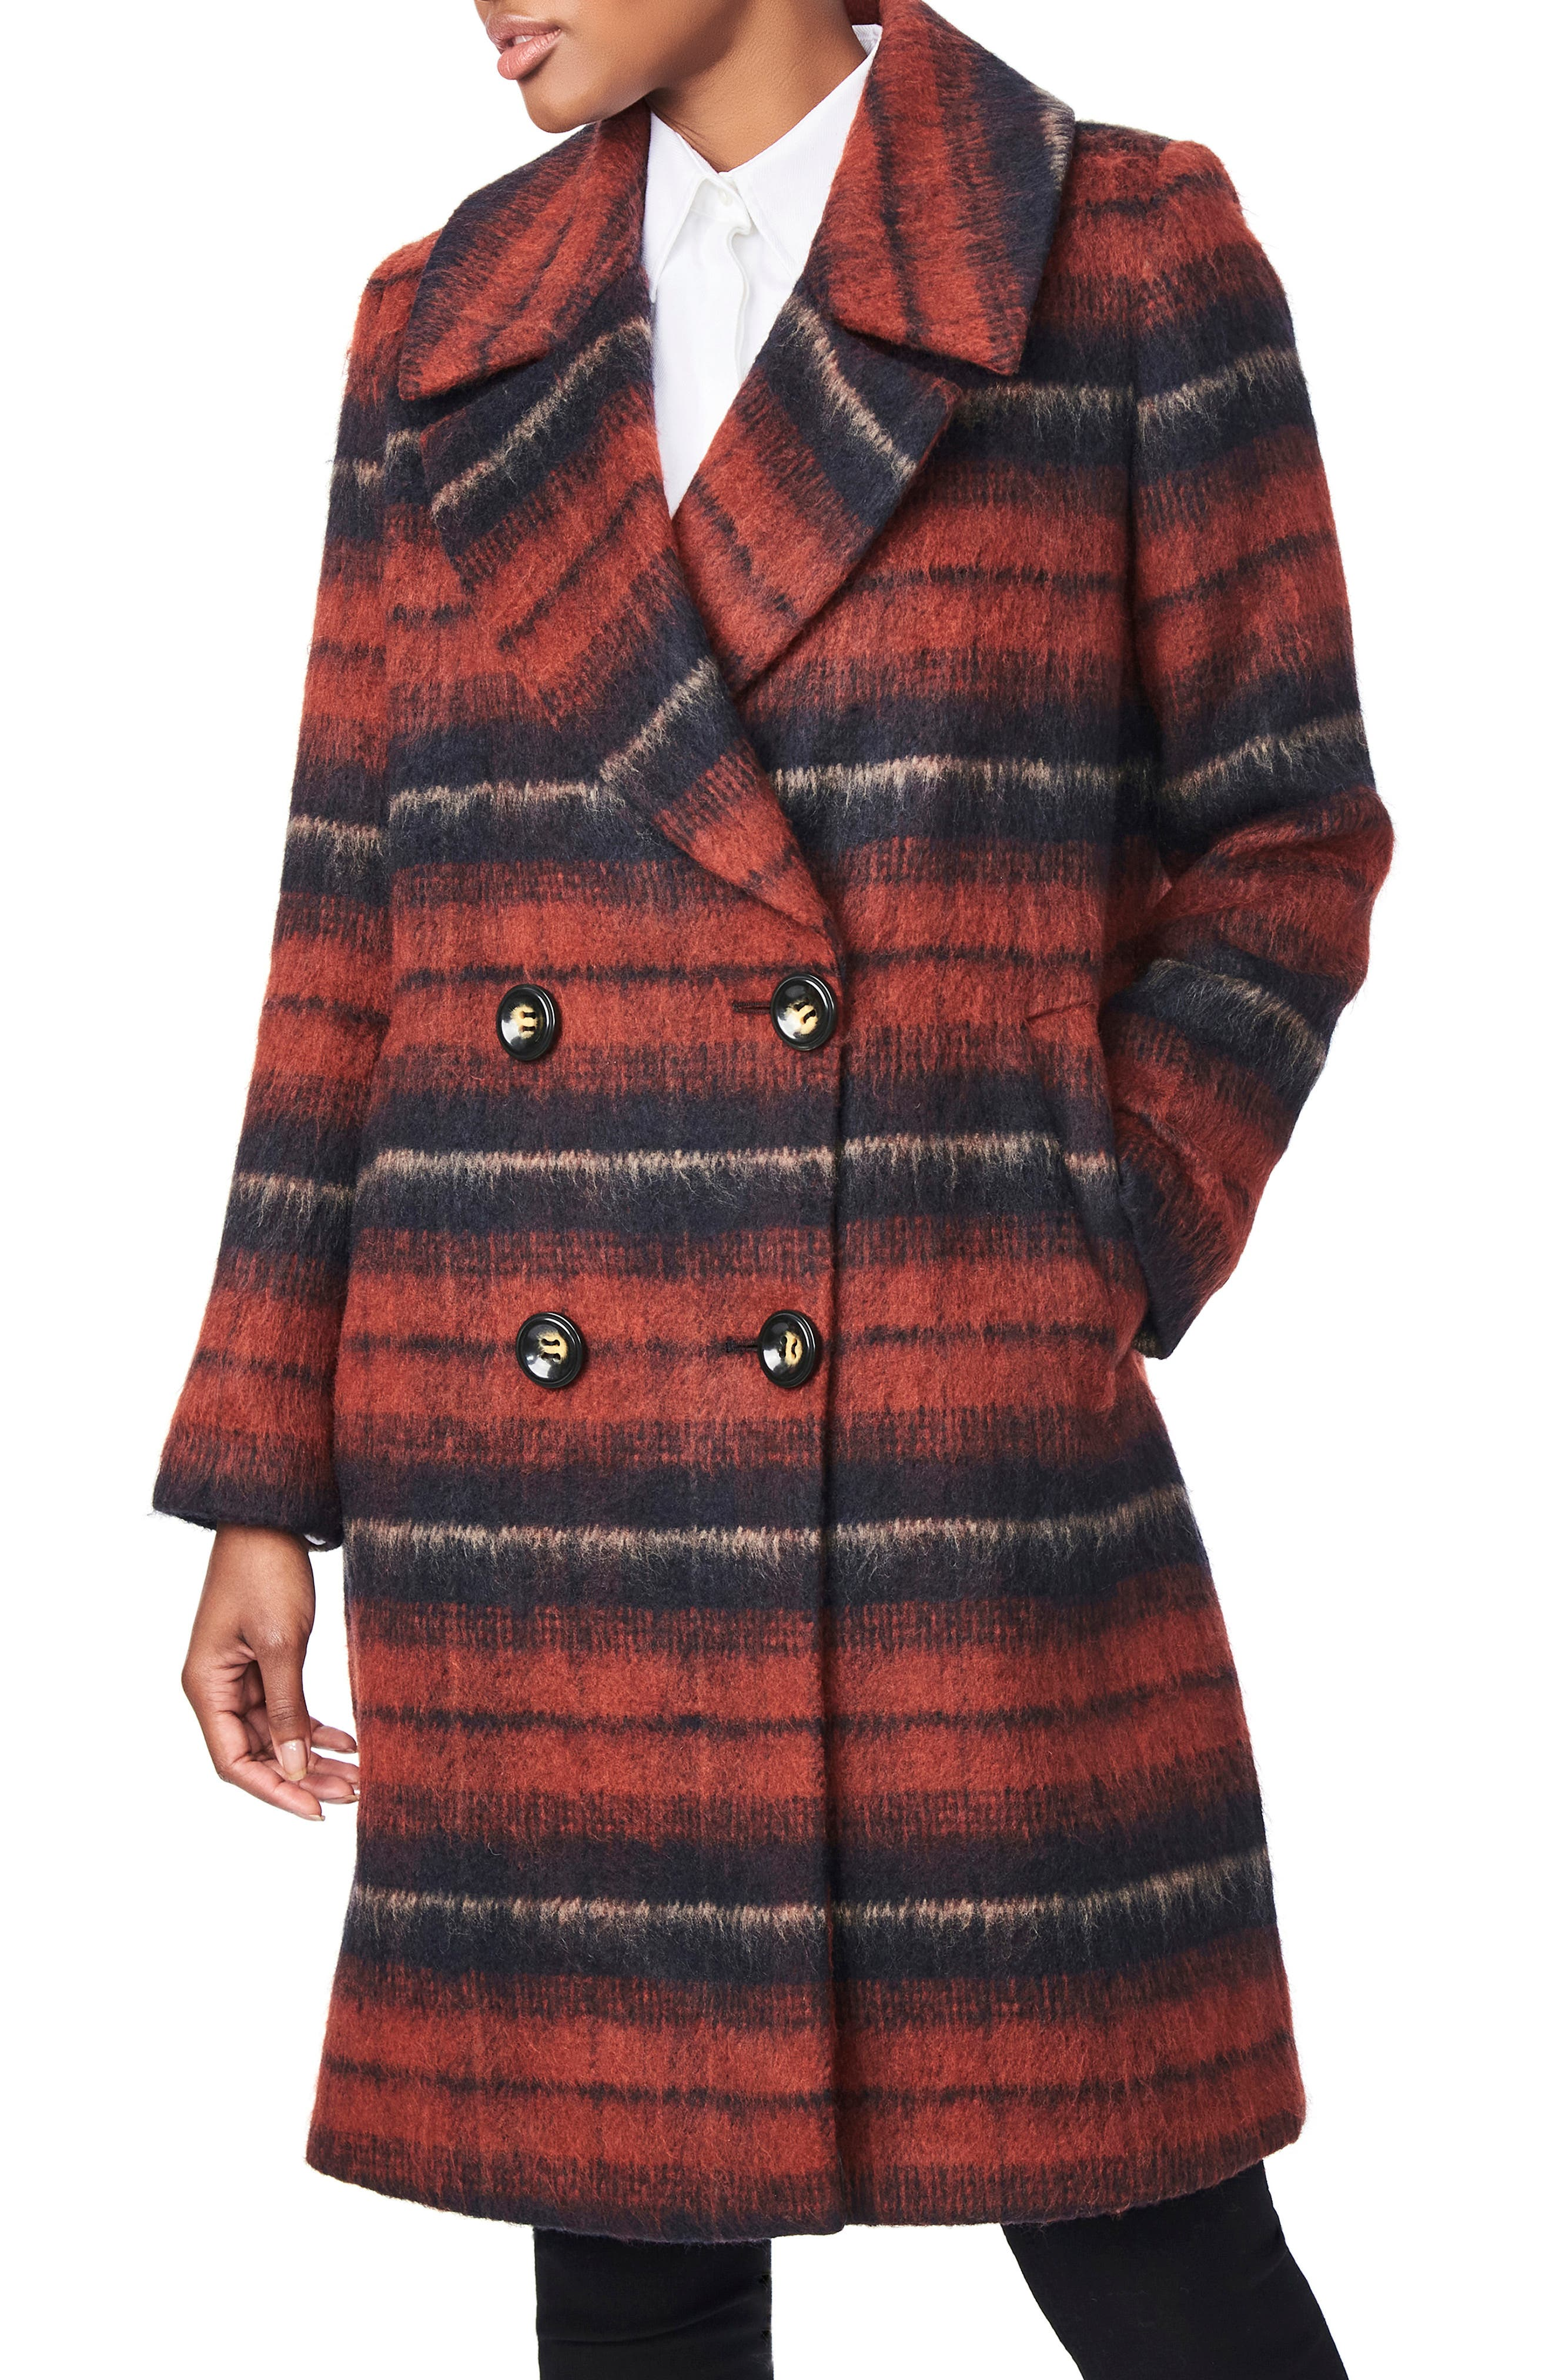 Vintage Coats & Jackets | Retro Coats and Jackets Womens Bernardo Plaid Coat $149.90 AT vintagedancer.com